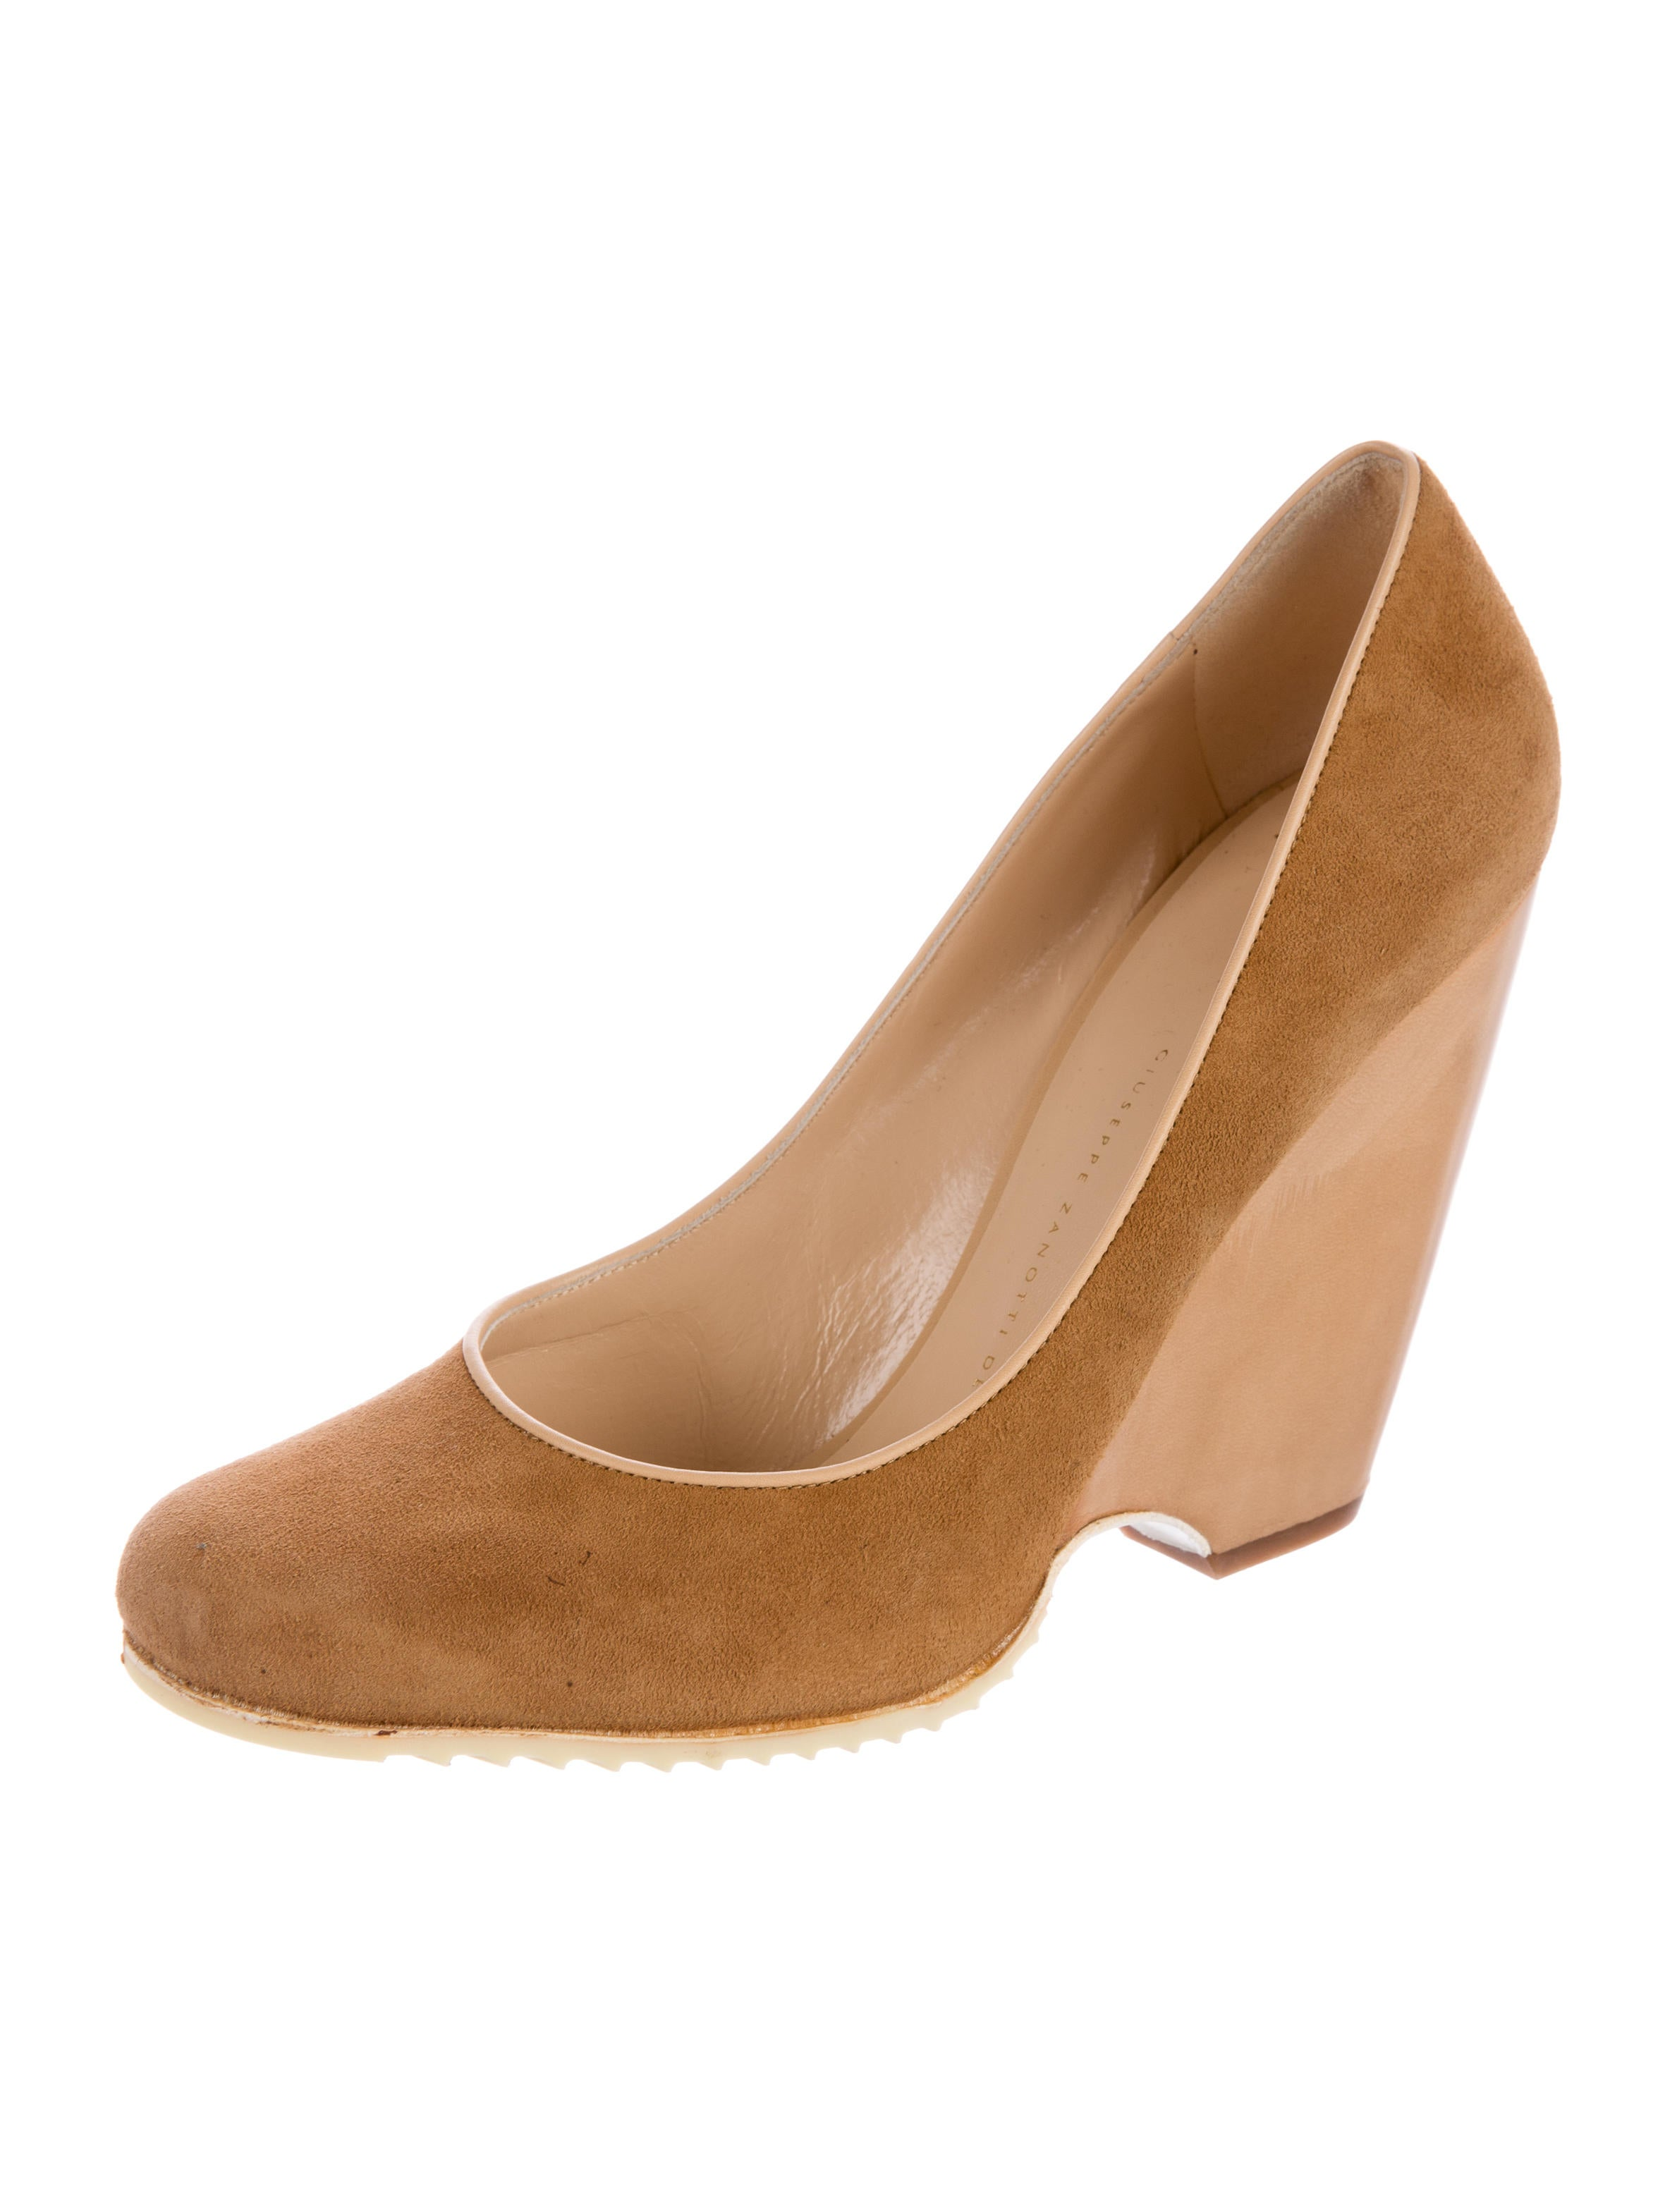 c974257d6b72 Giuseppe Zanotti Black Instagram Shopstyle Boots